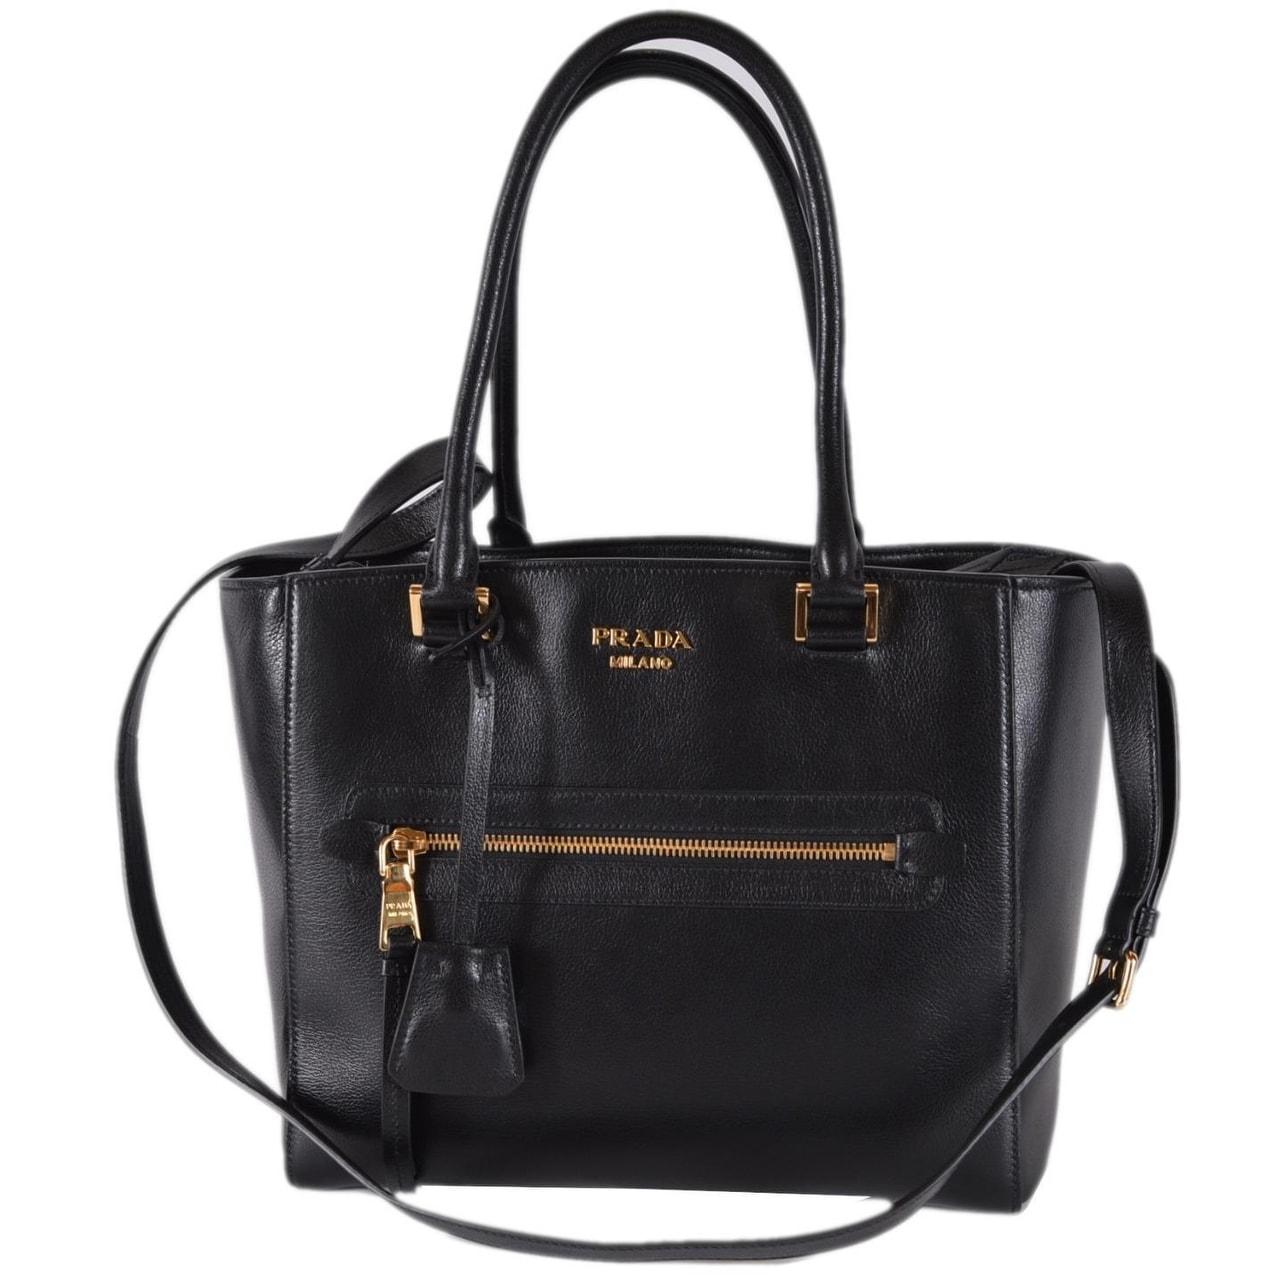 Shop Prada 1BG227 Black Glace Leather Medium Convertible Purse Handbag Tote  - Free Shipping Today - Overstock - 26441160